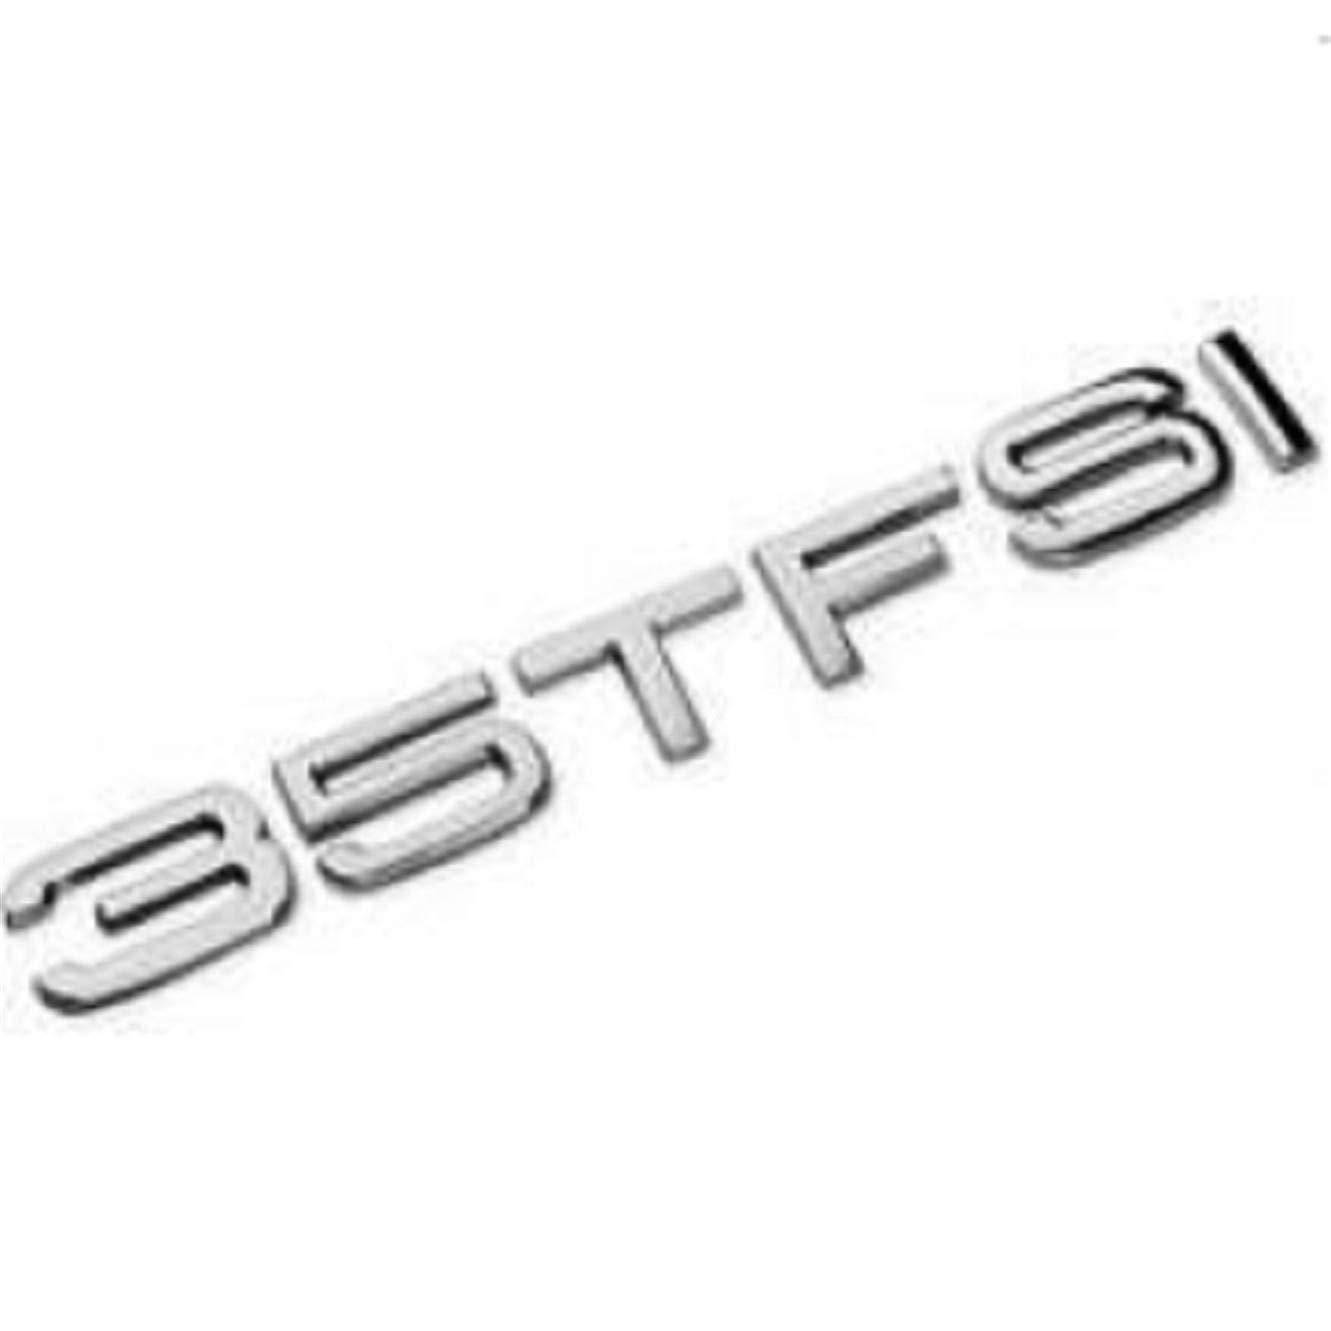 Emblema 30 35 40 45 50 55 TFSI distintivo per A3 A4 A6 A7 A8 S4 S5 S6 S8 Q5